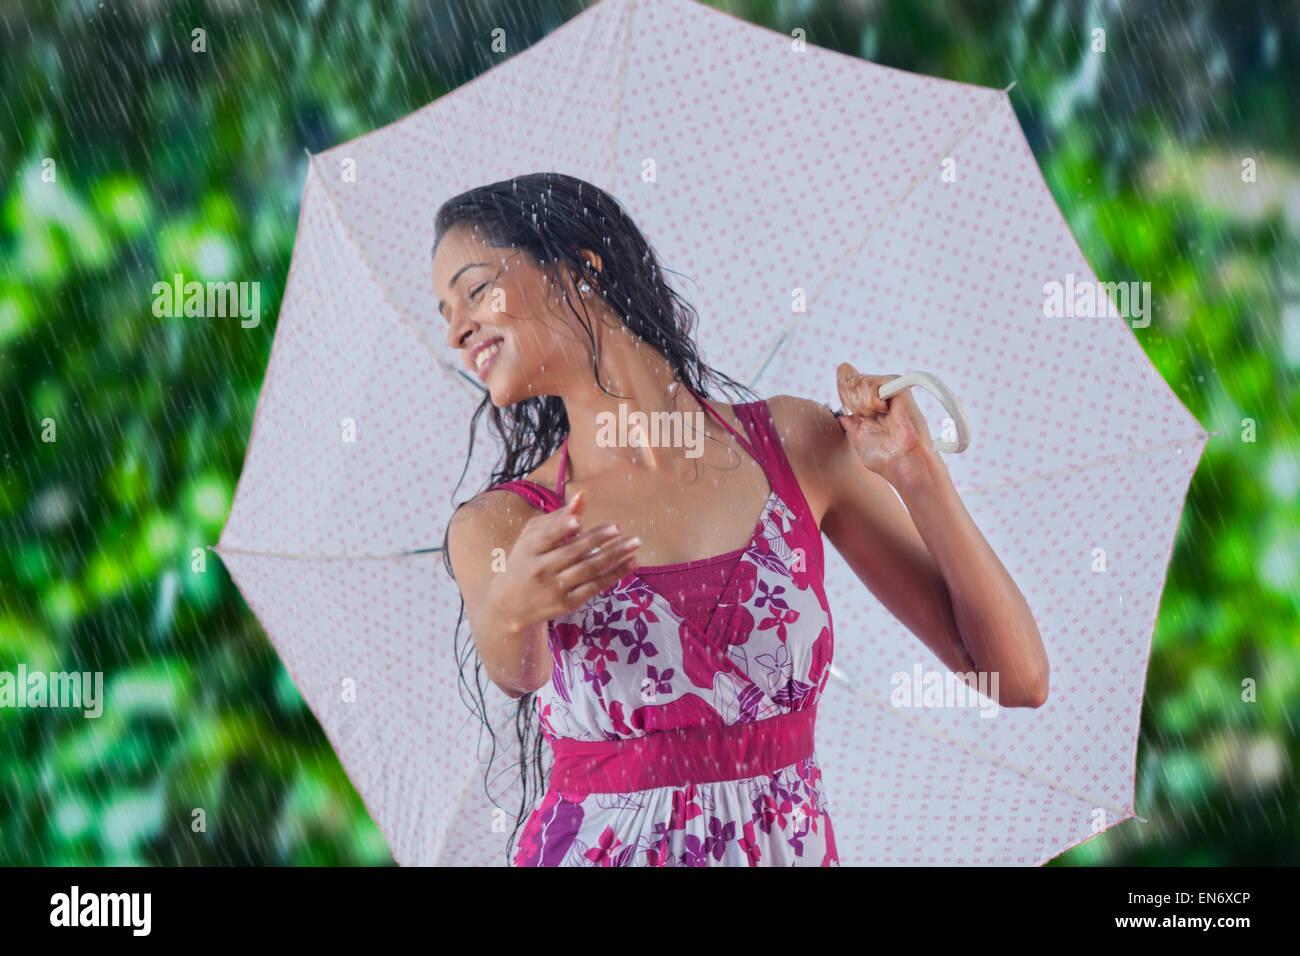 Woman with umbrella enjoying the rain Stock Photo